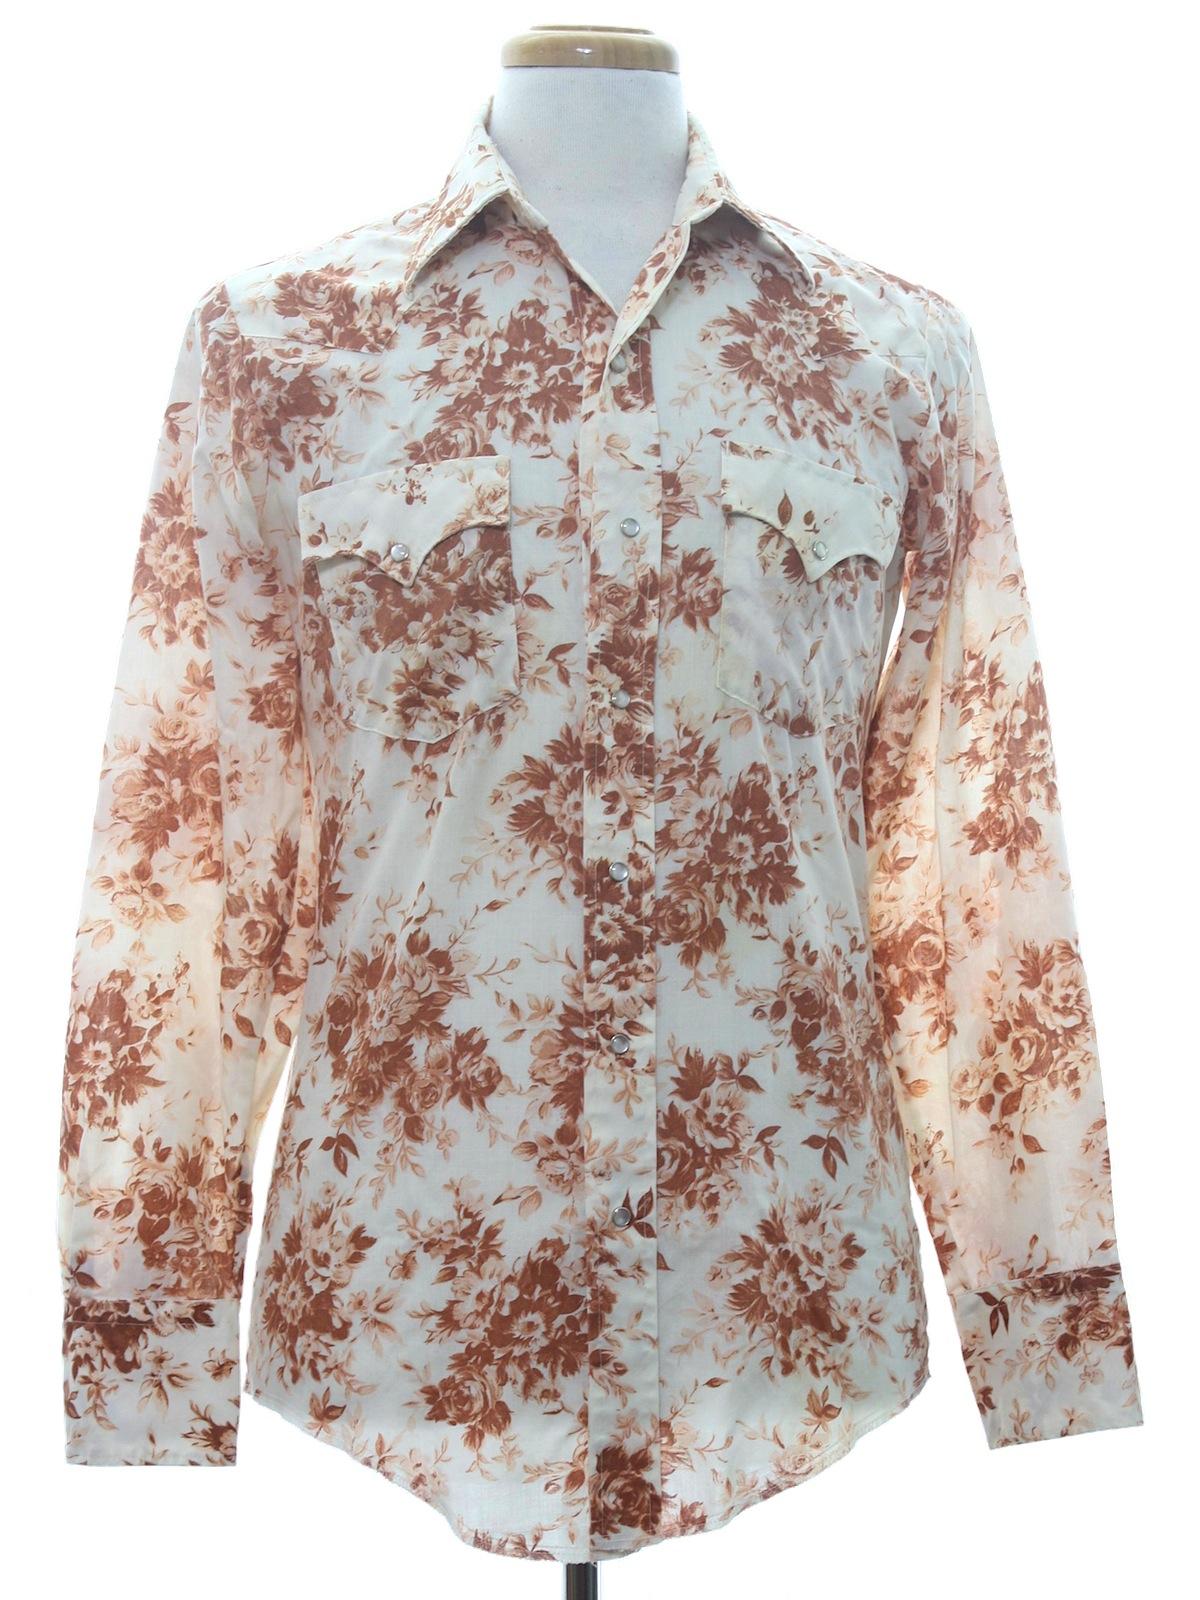 Vintage 1970s Western Shirt 70s No Label Mens Cream